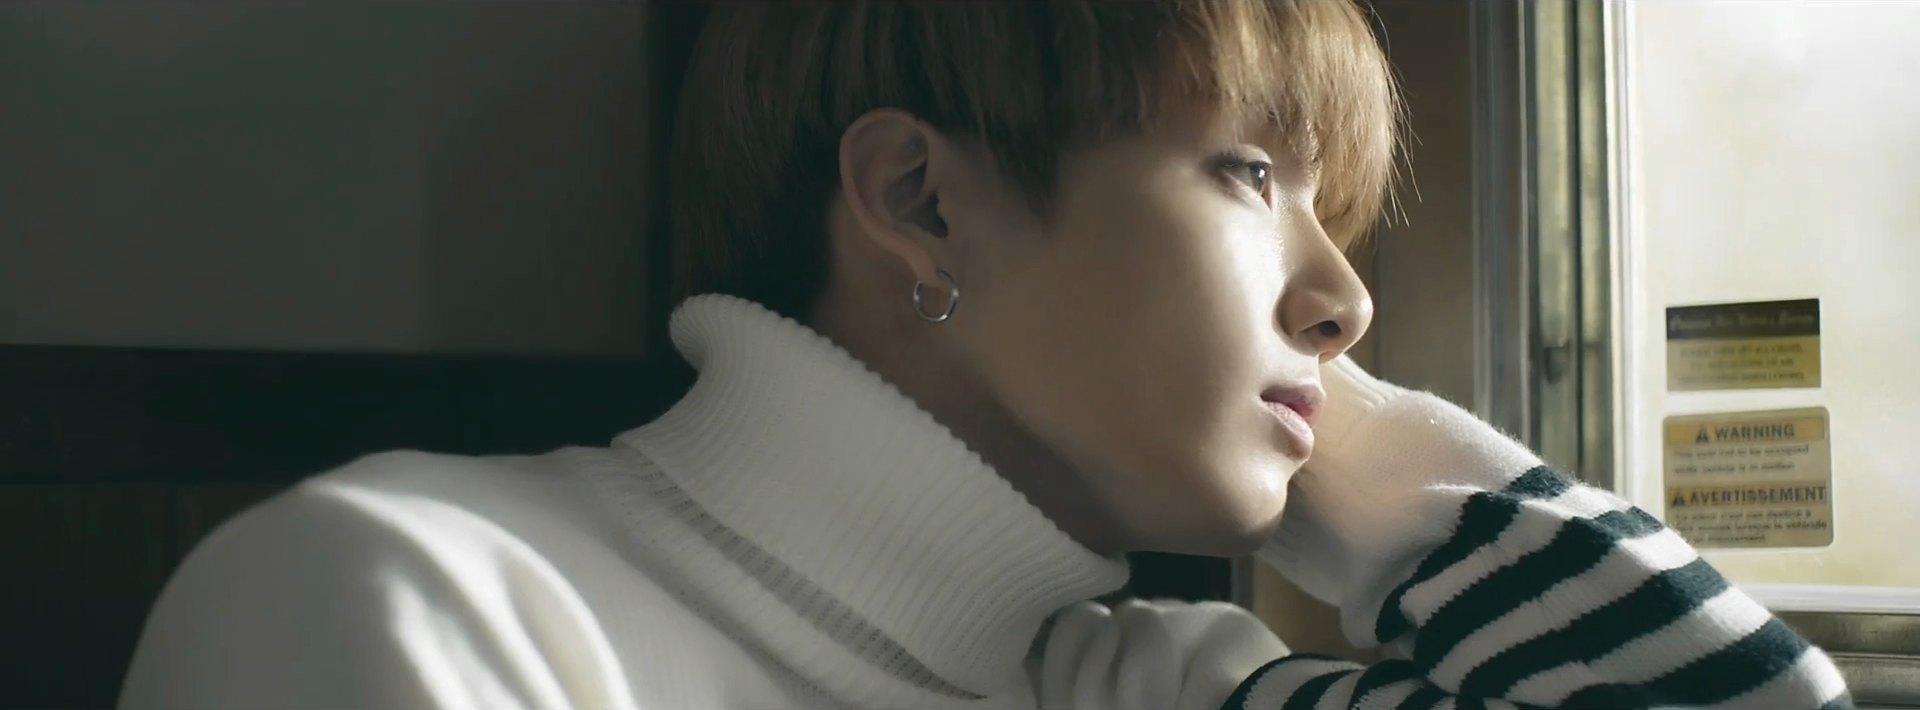 BTS - Spring Day who's who - K-Pop Database / dbkpop com